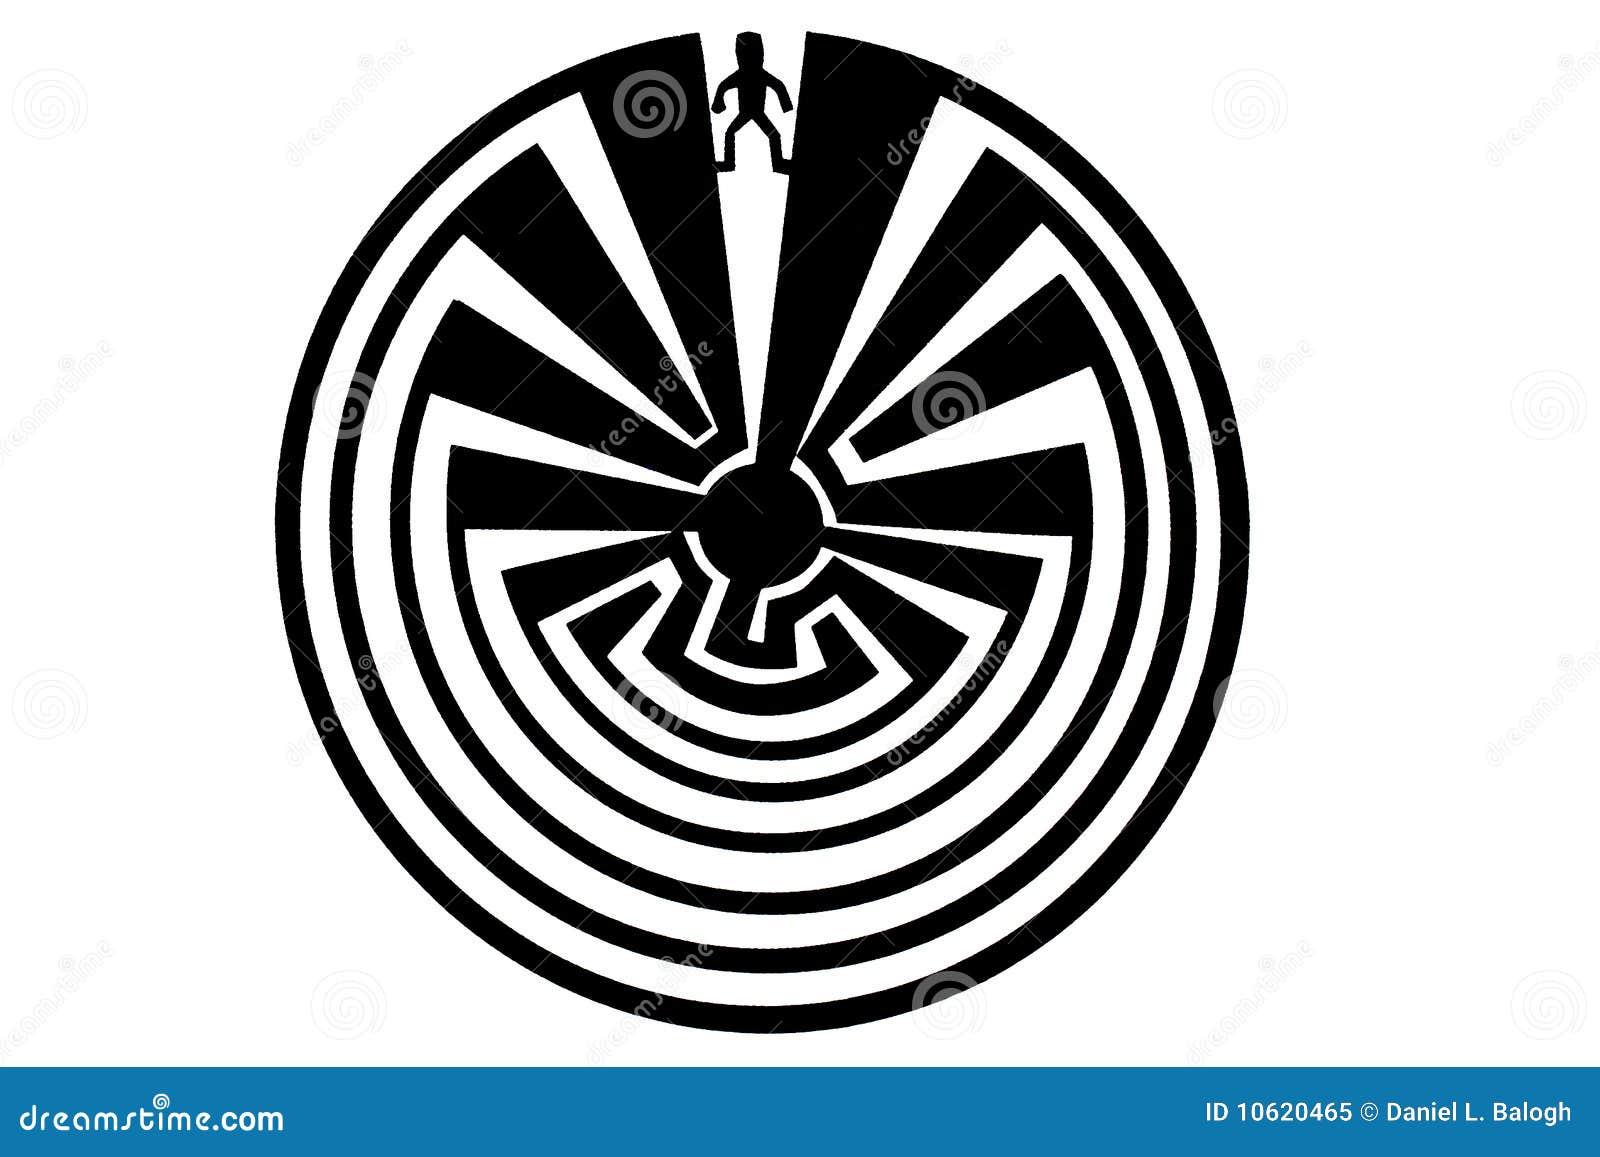 Man In The Maze Indian Symbol Stock Illustration Illustration Of